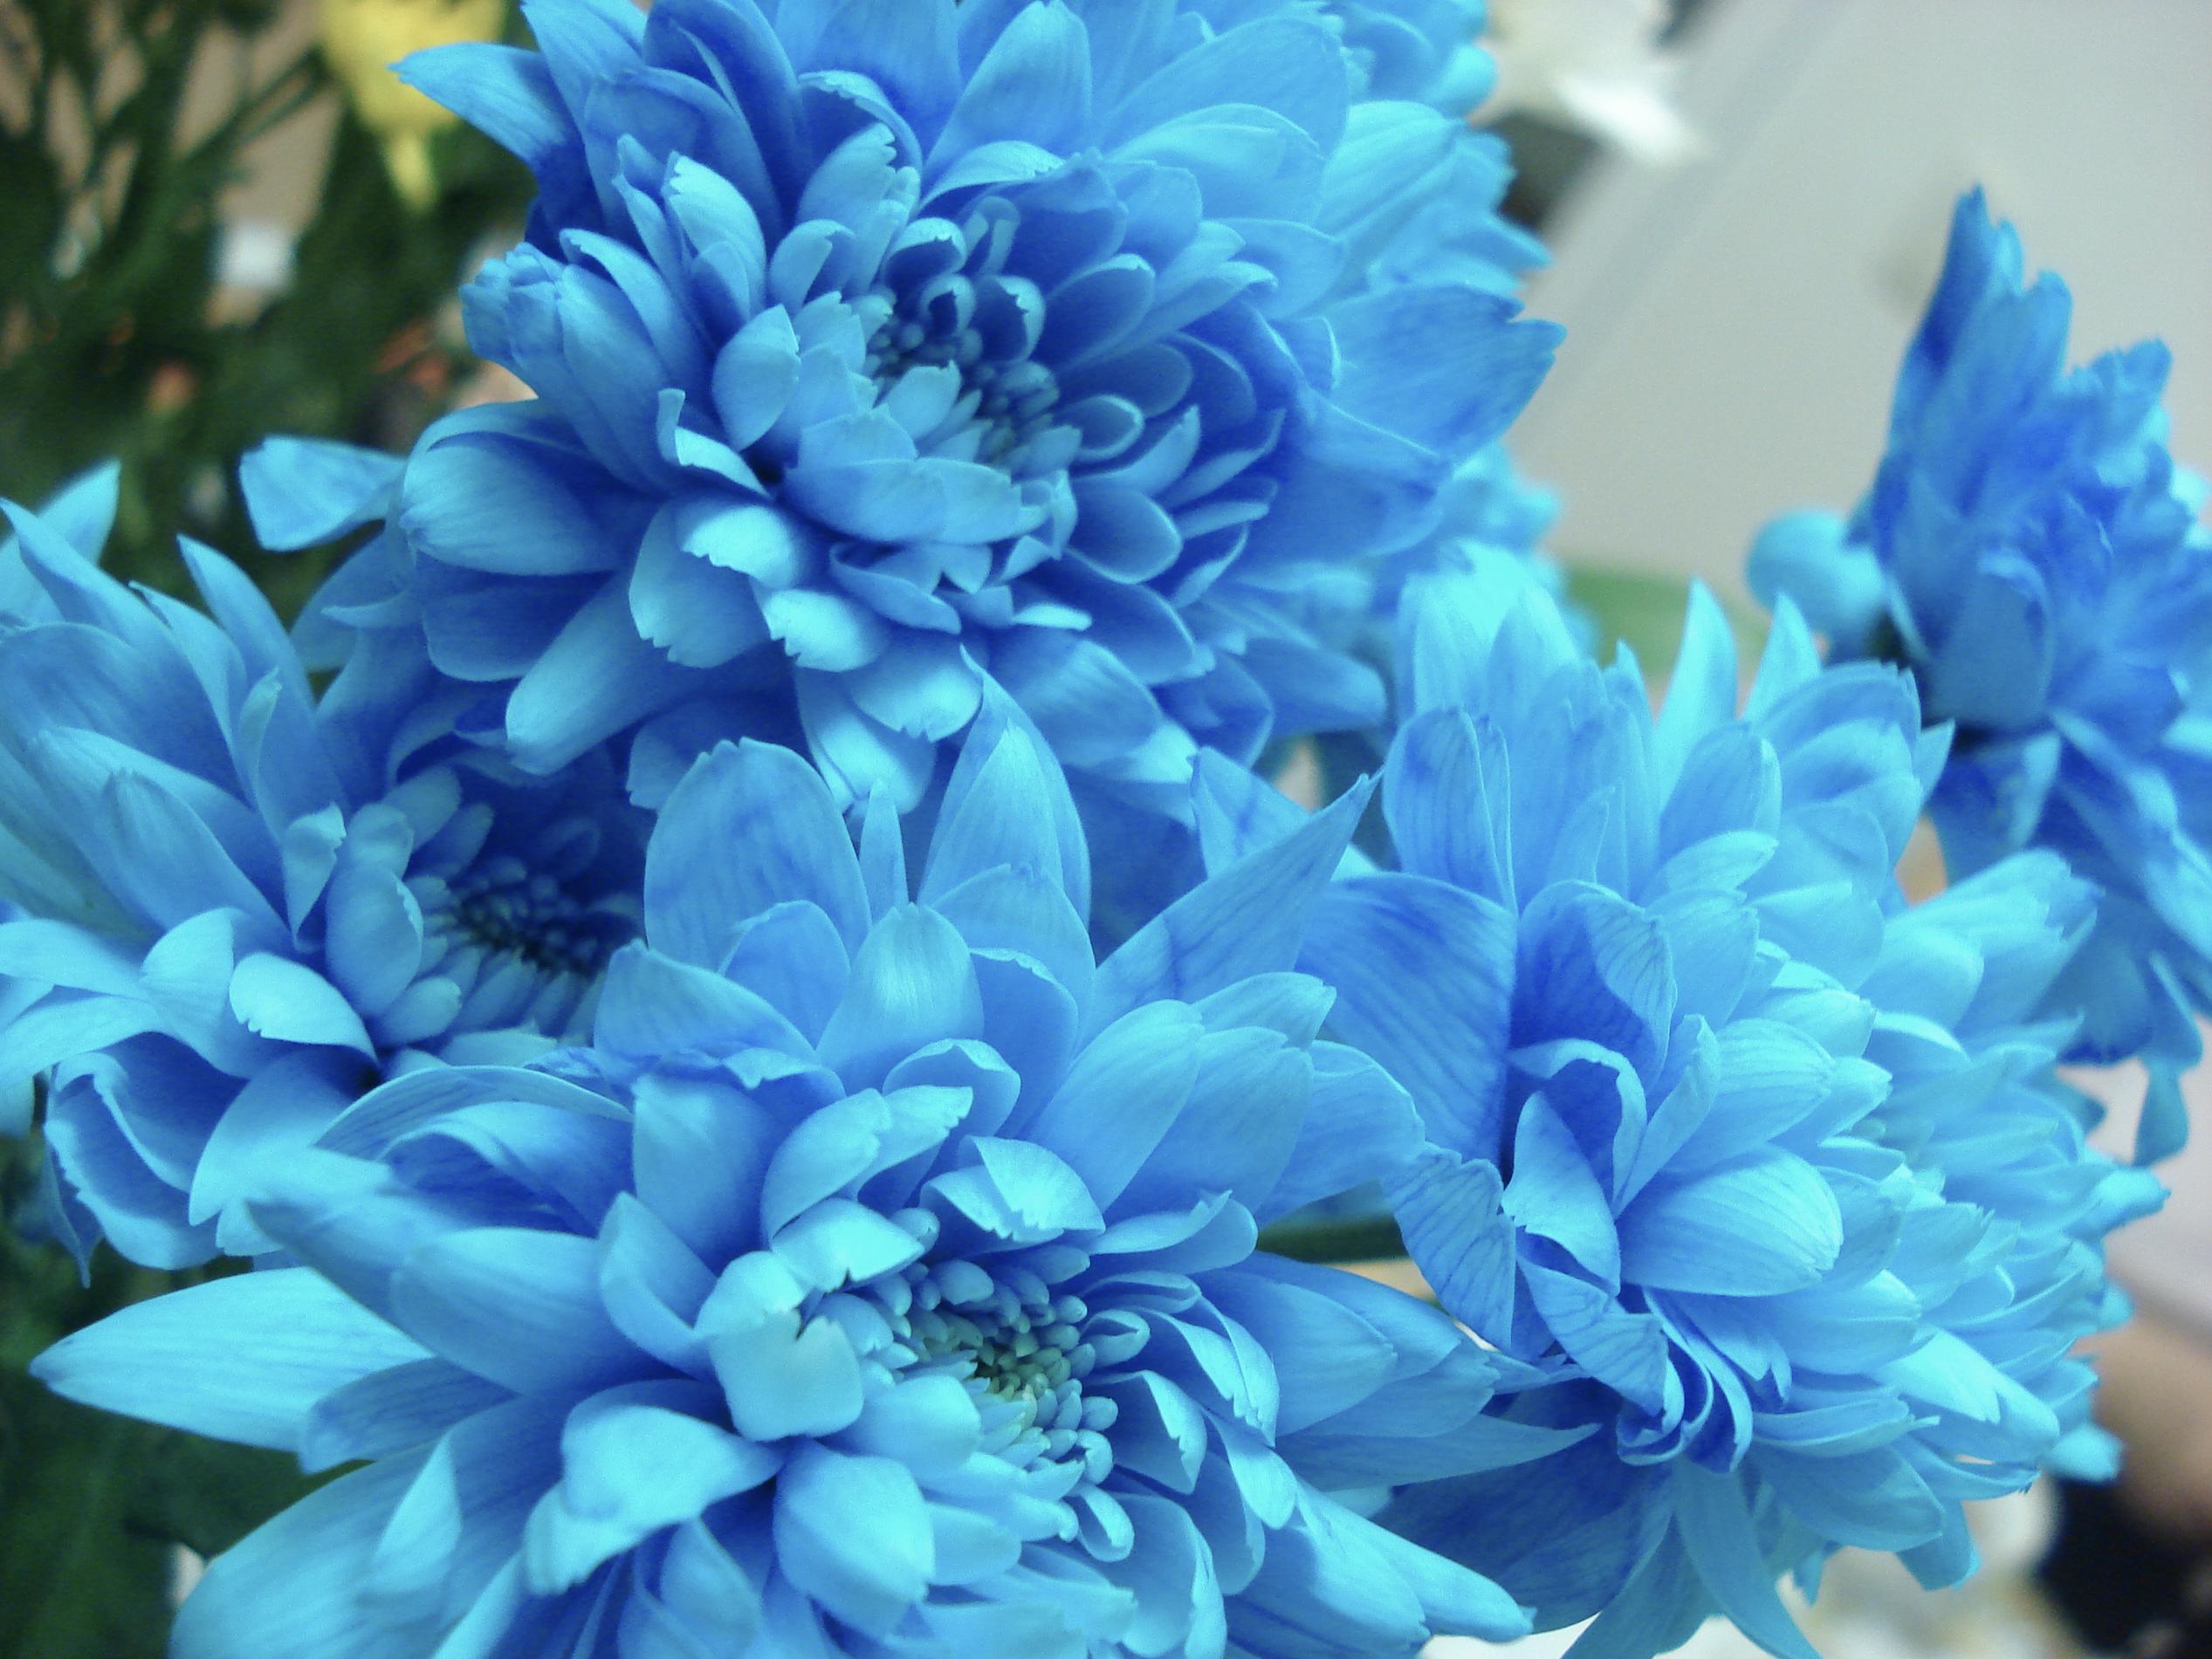 Summer flower blue flowers blue flowers izmirmasajfo